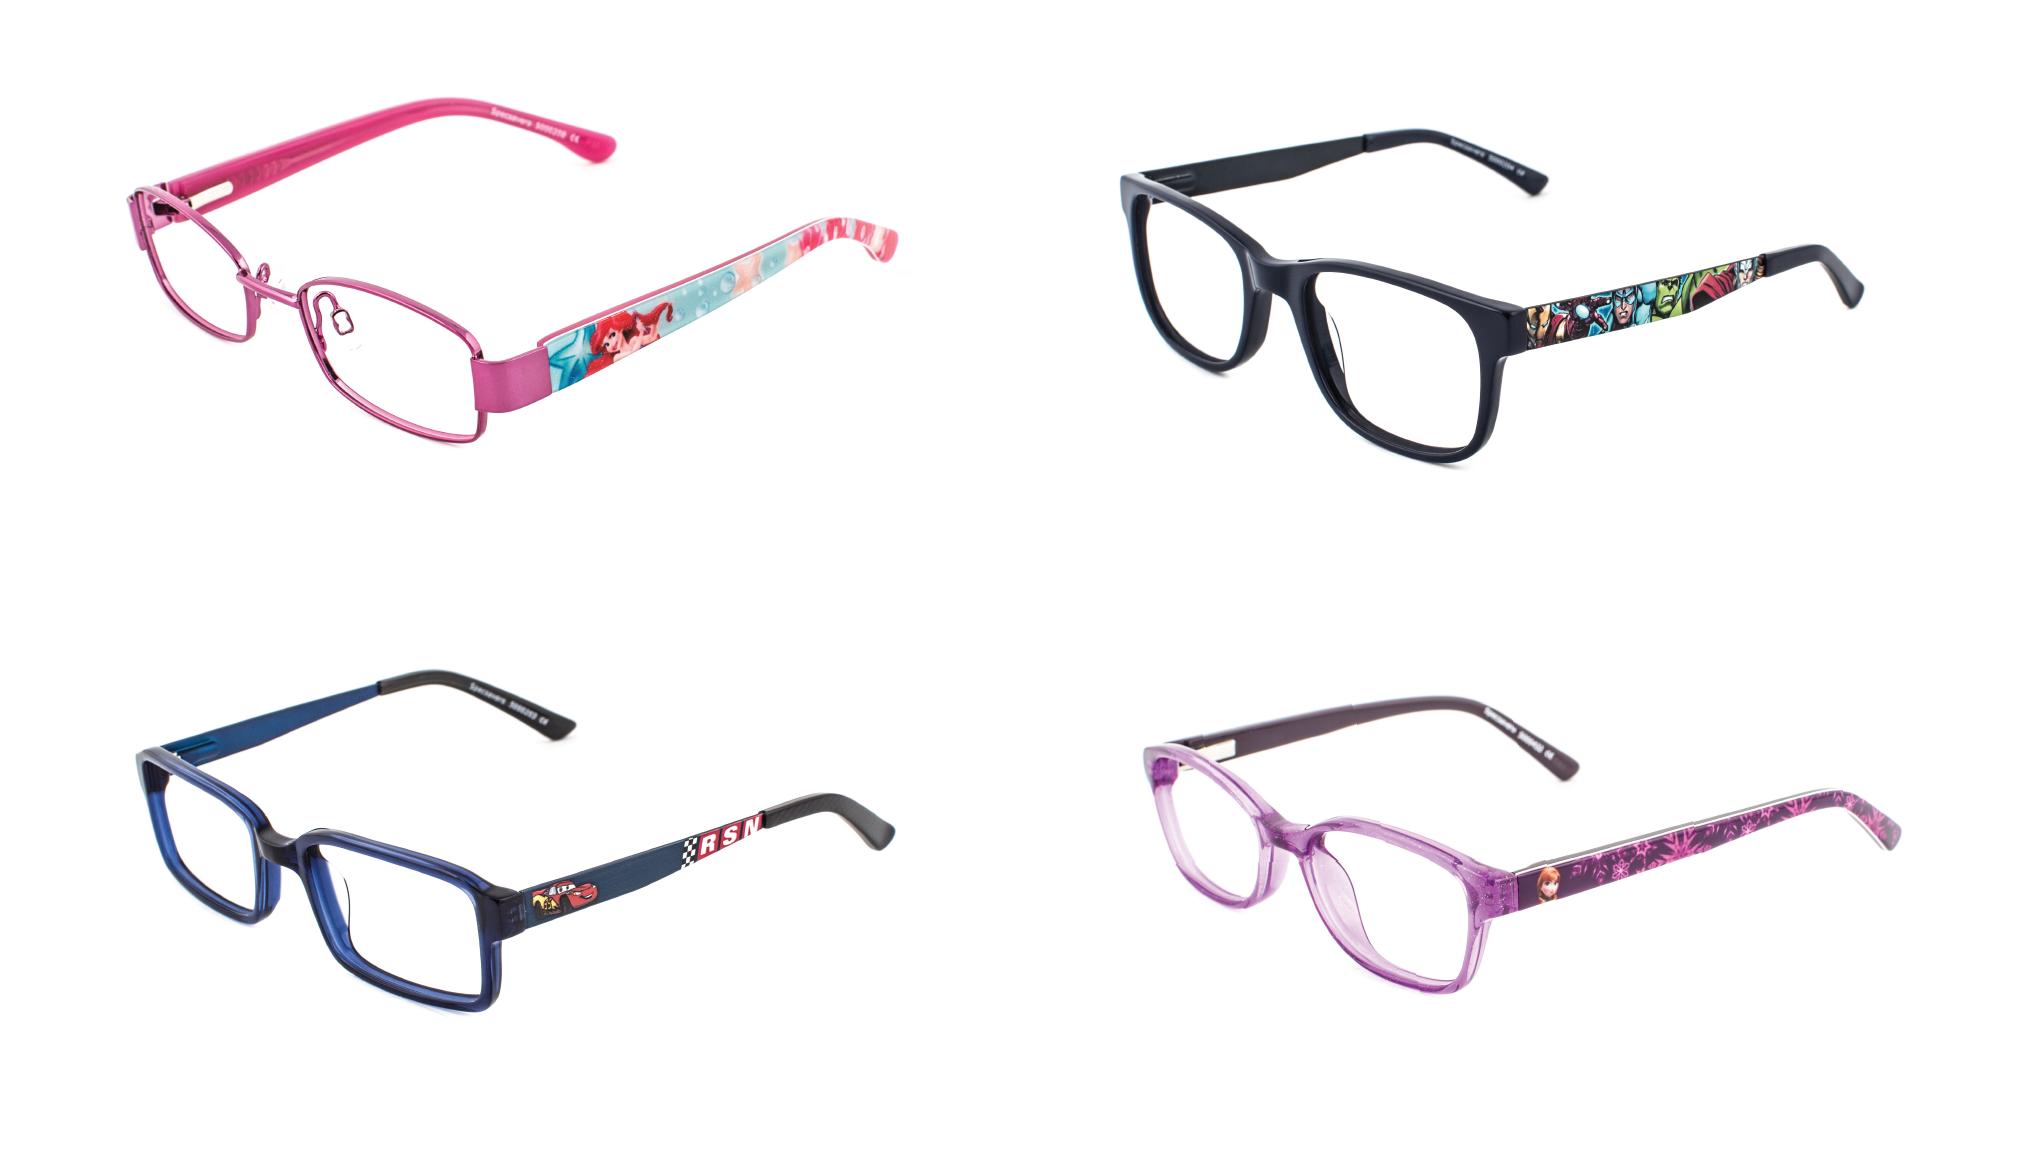 b37ba1ba135 Specsavers Disney frames and toy pack - Kiwi Families